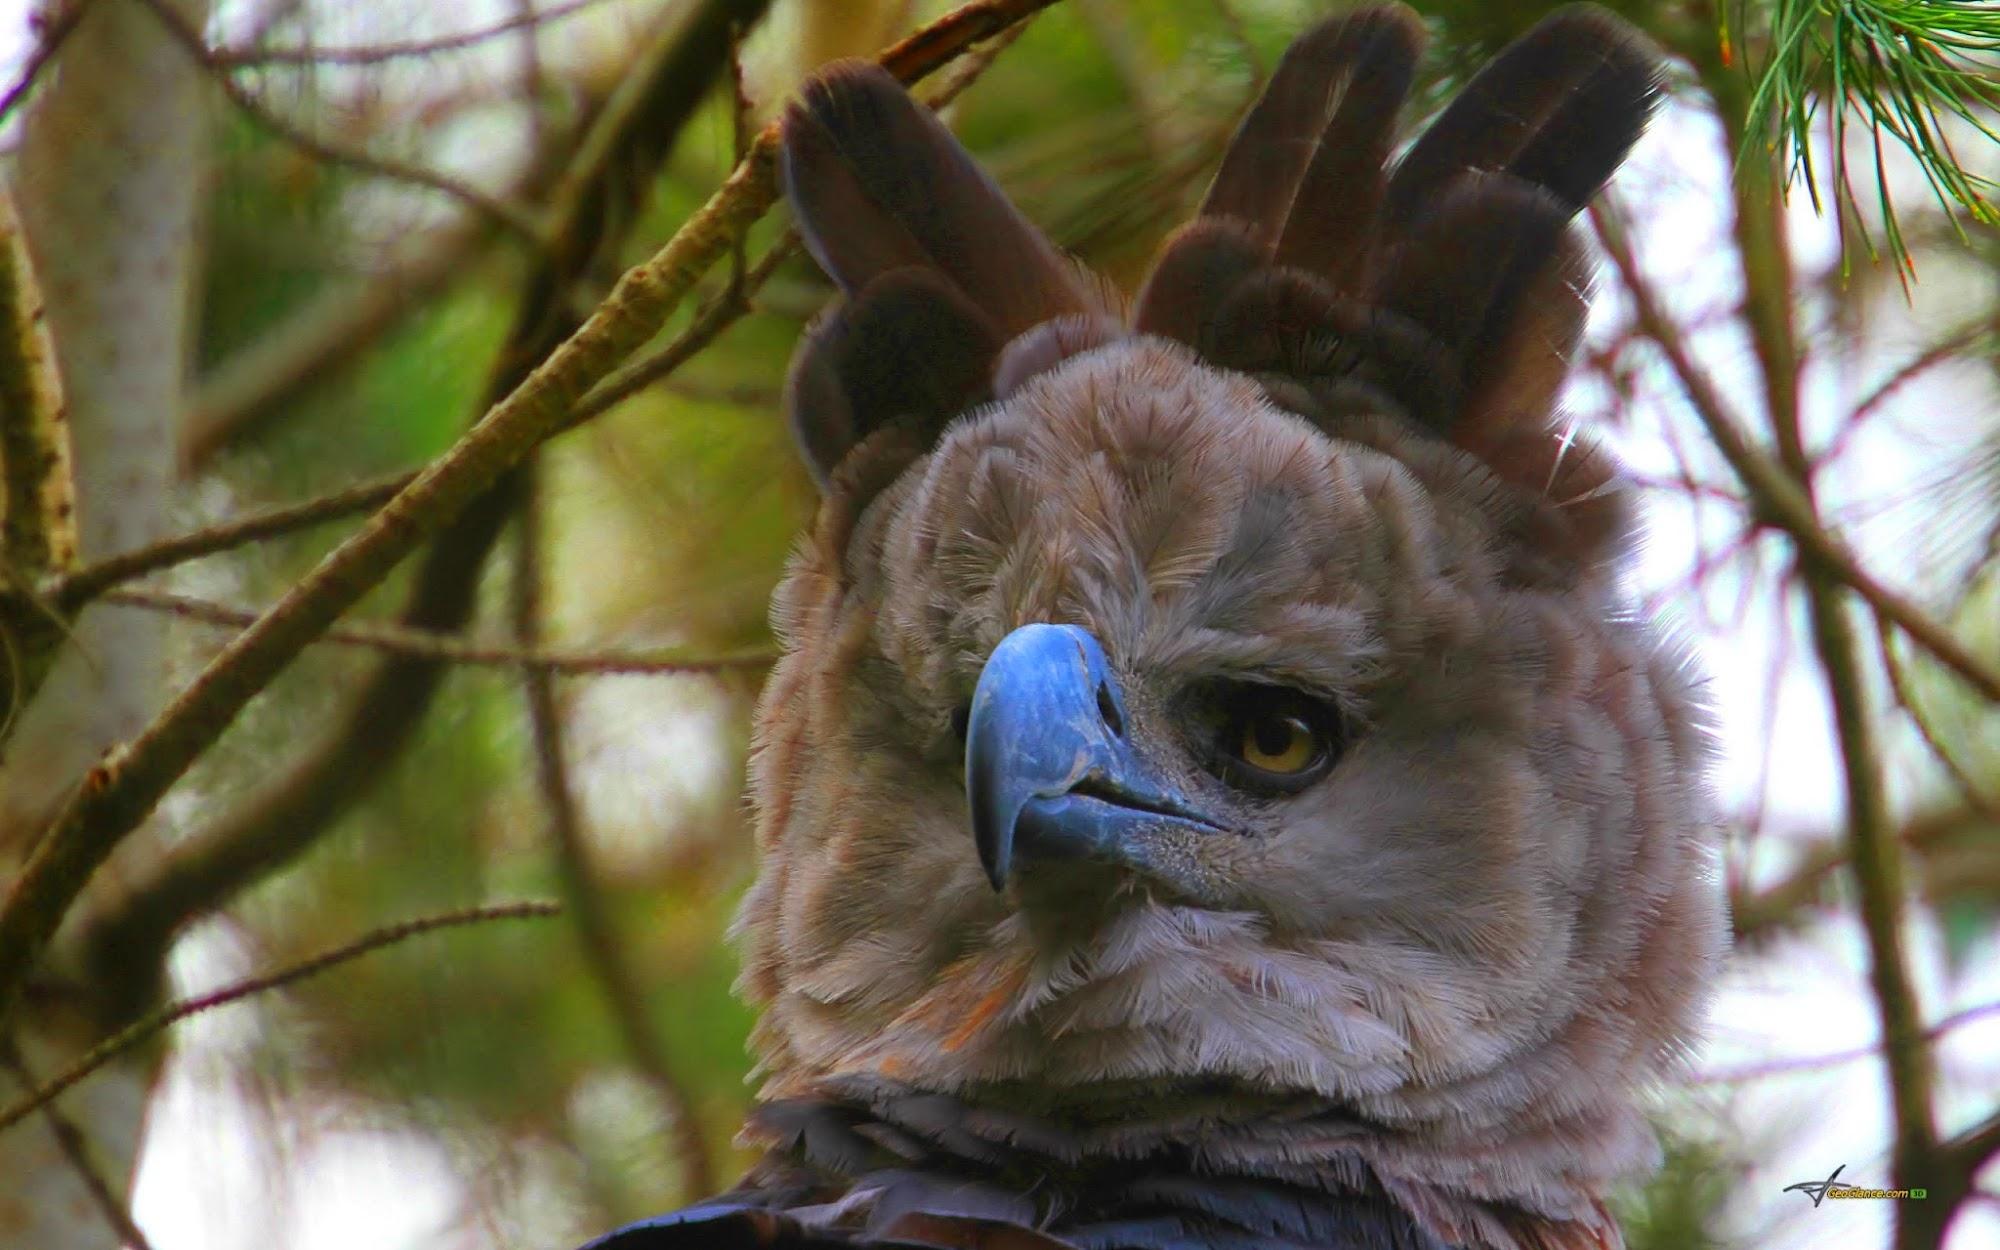 Harpy eagle wallpaper bacgrounds wallpaper backgrounds - Harpy eagle hd wallpaper ...